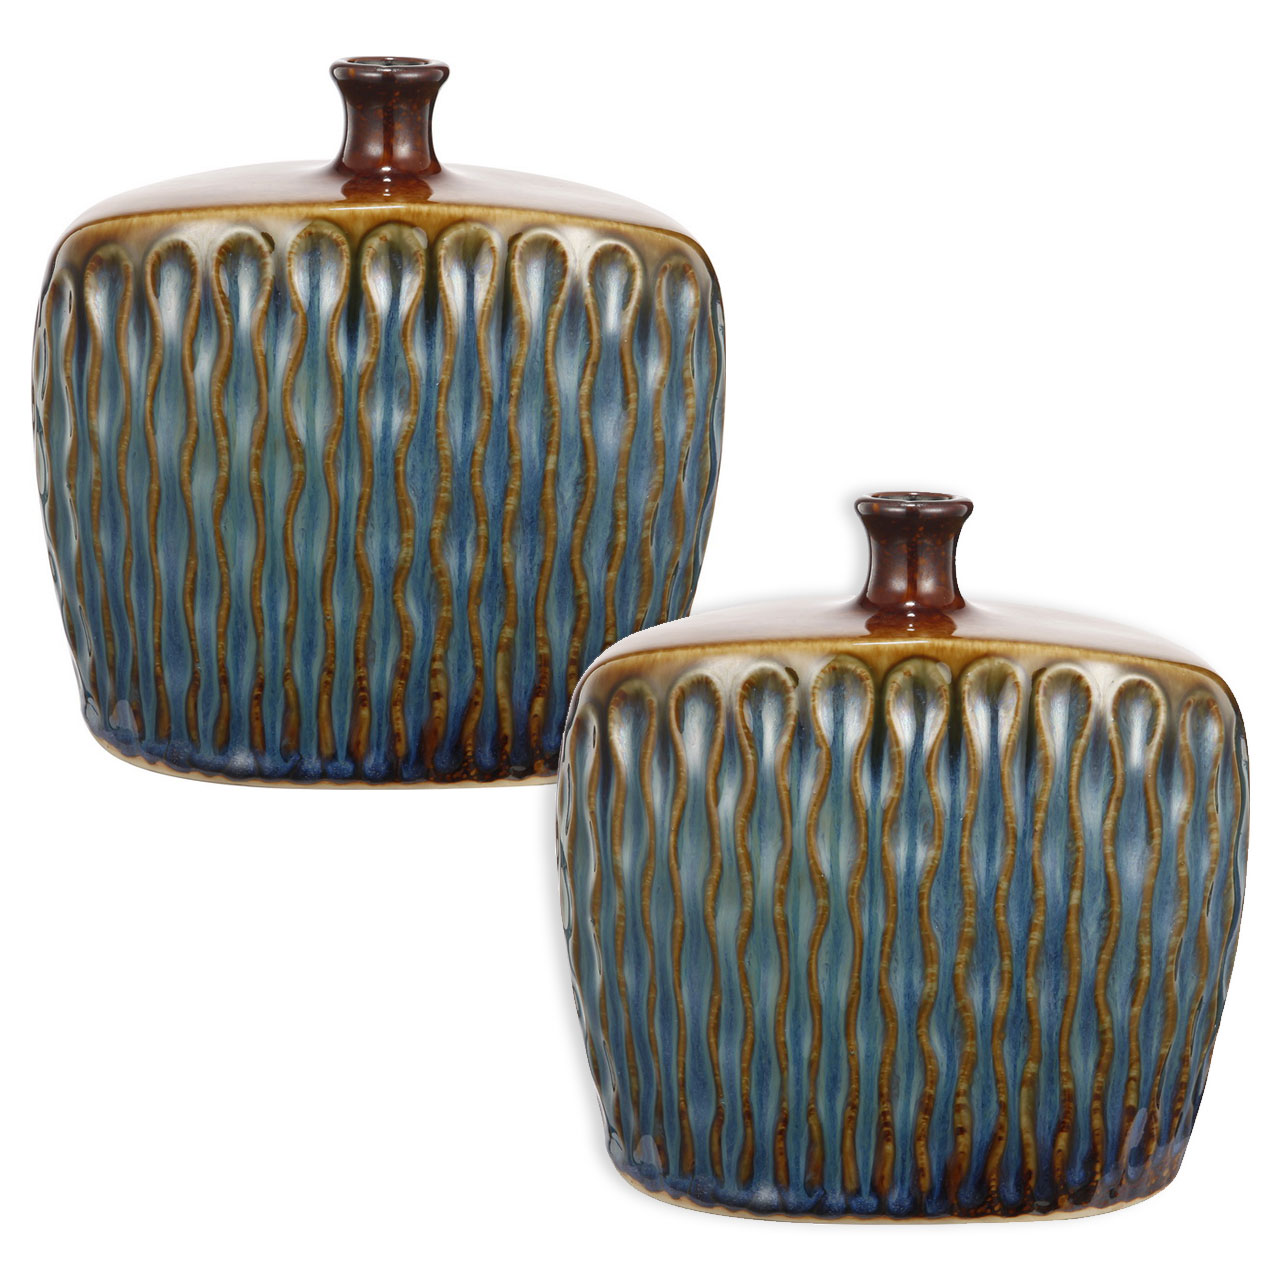 {} ARTEVALUCE Ваза Xylia (10х20х20 см - 2 шт) ваза mughal l 20 х 20 х 30 см